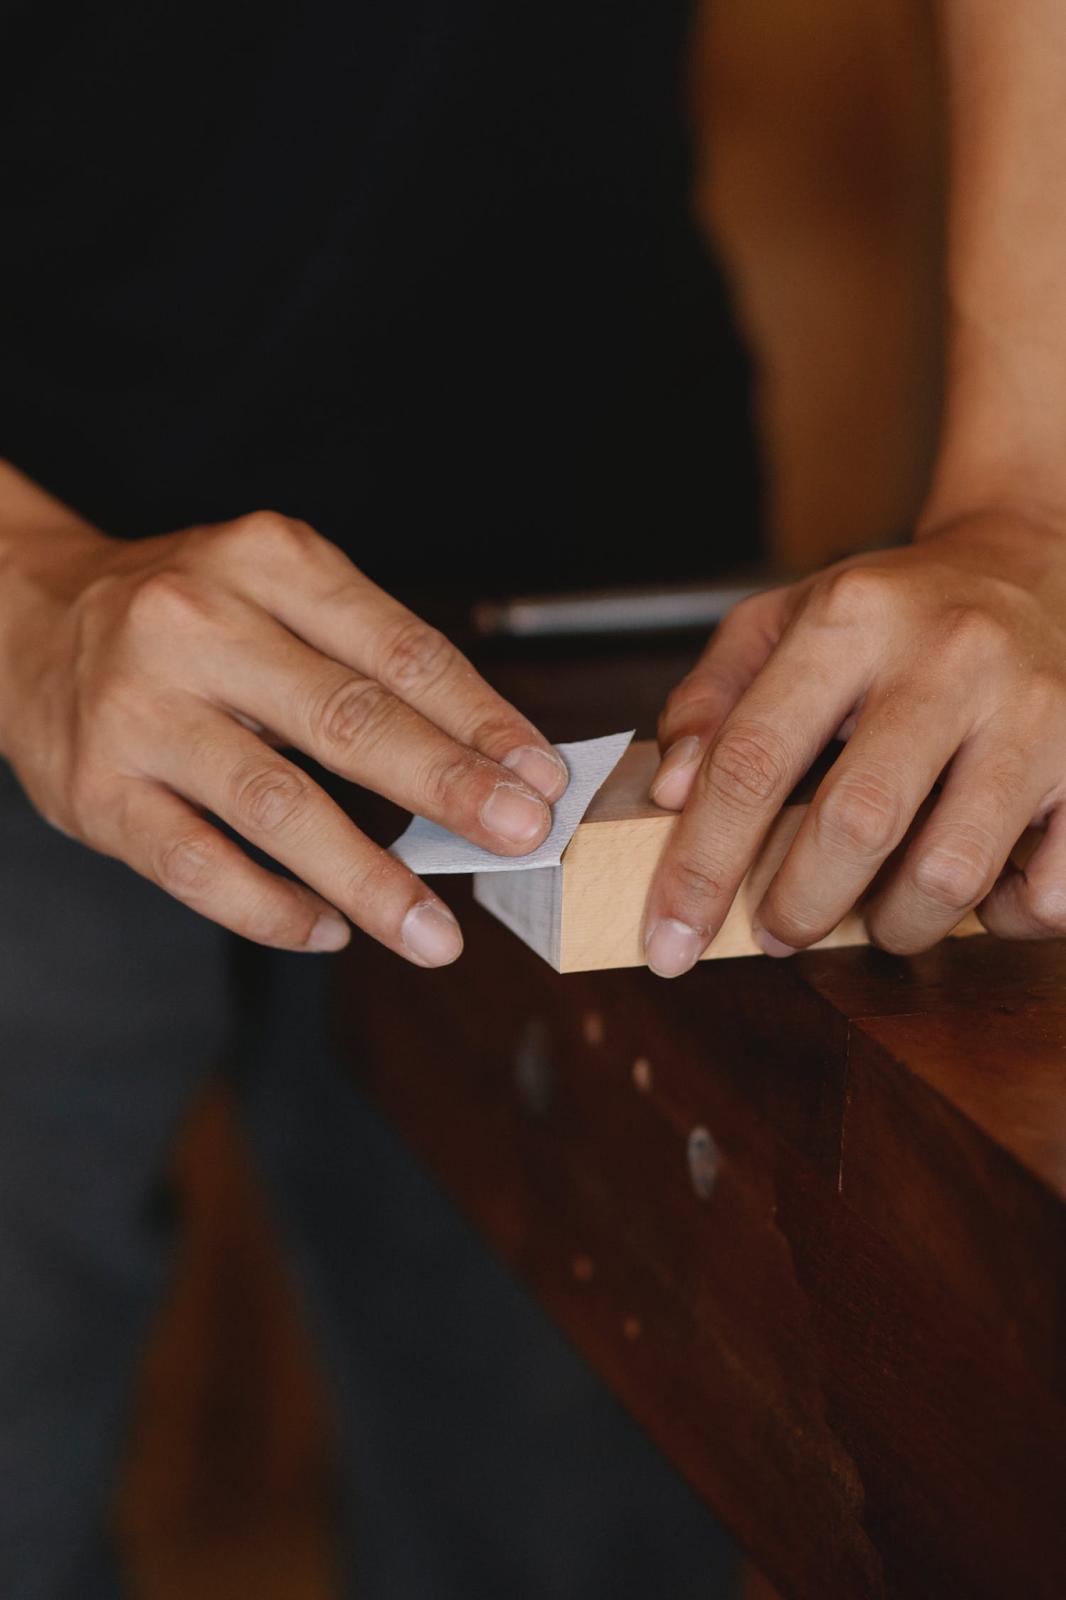 man using sandpaper on wood